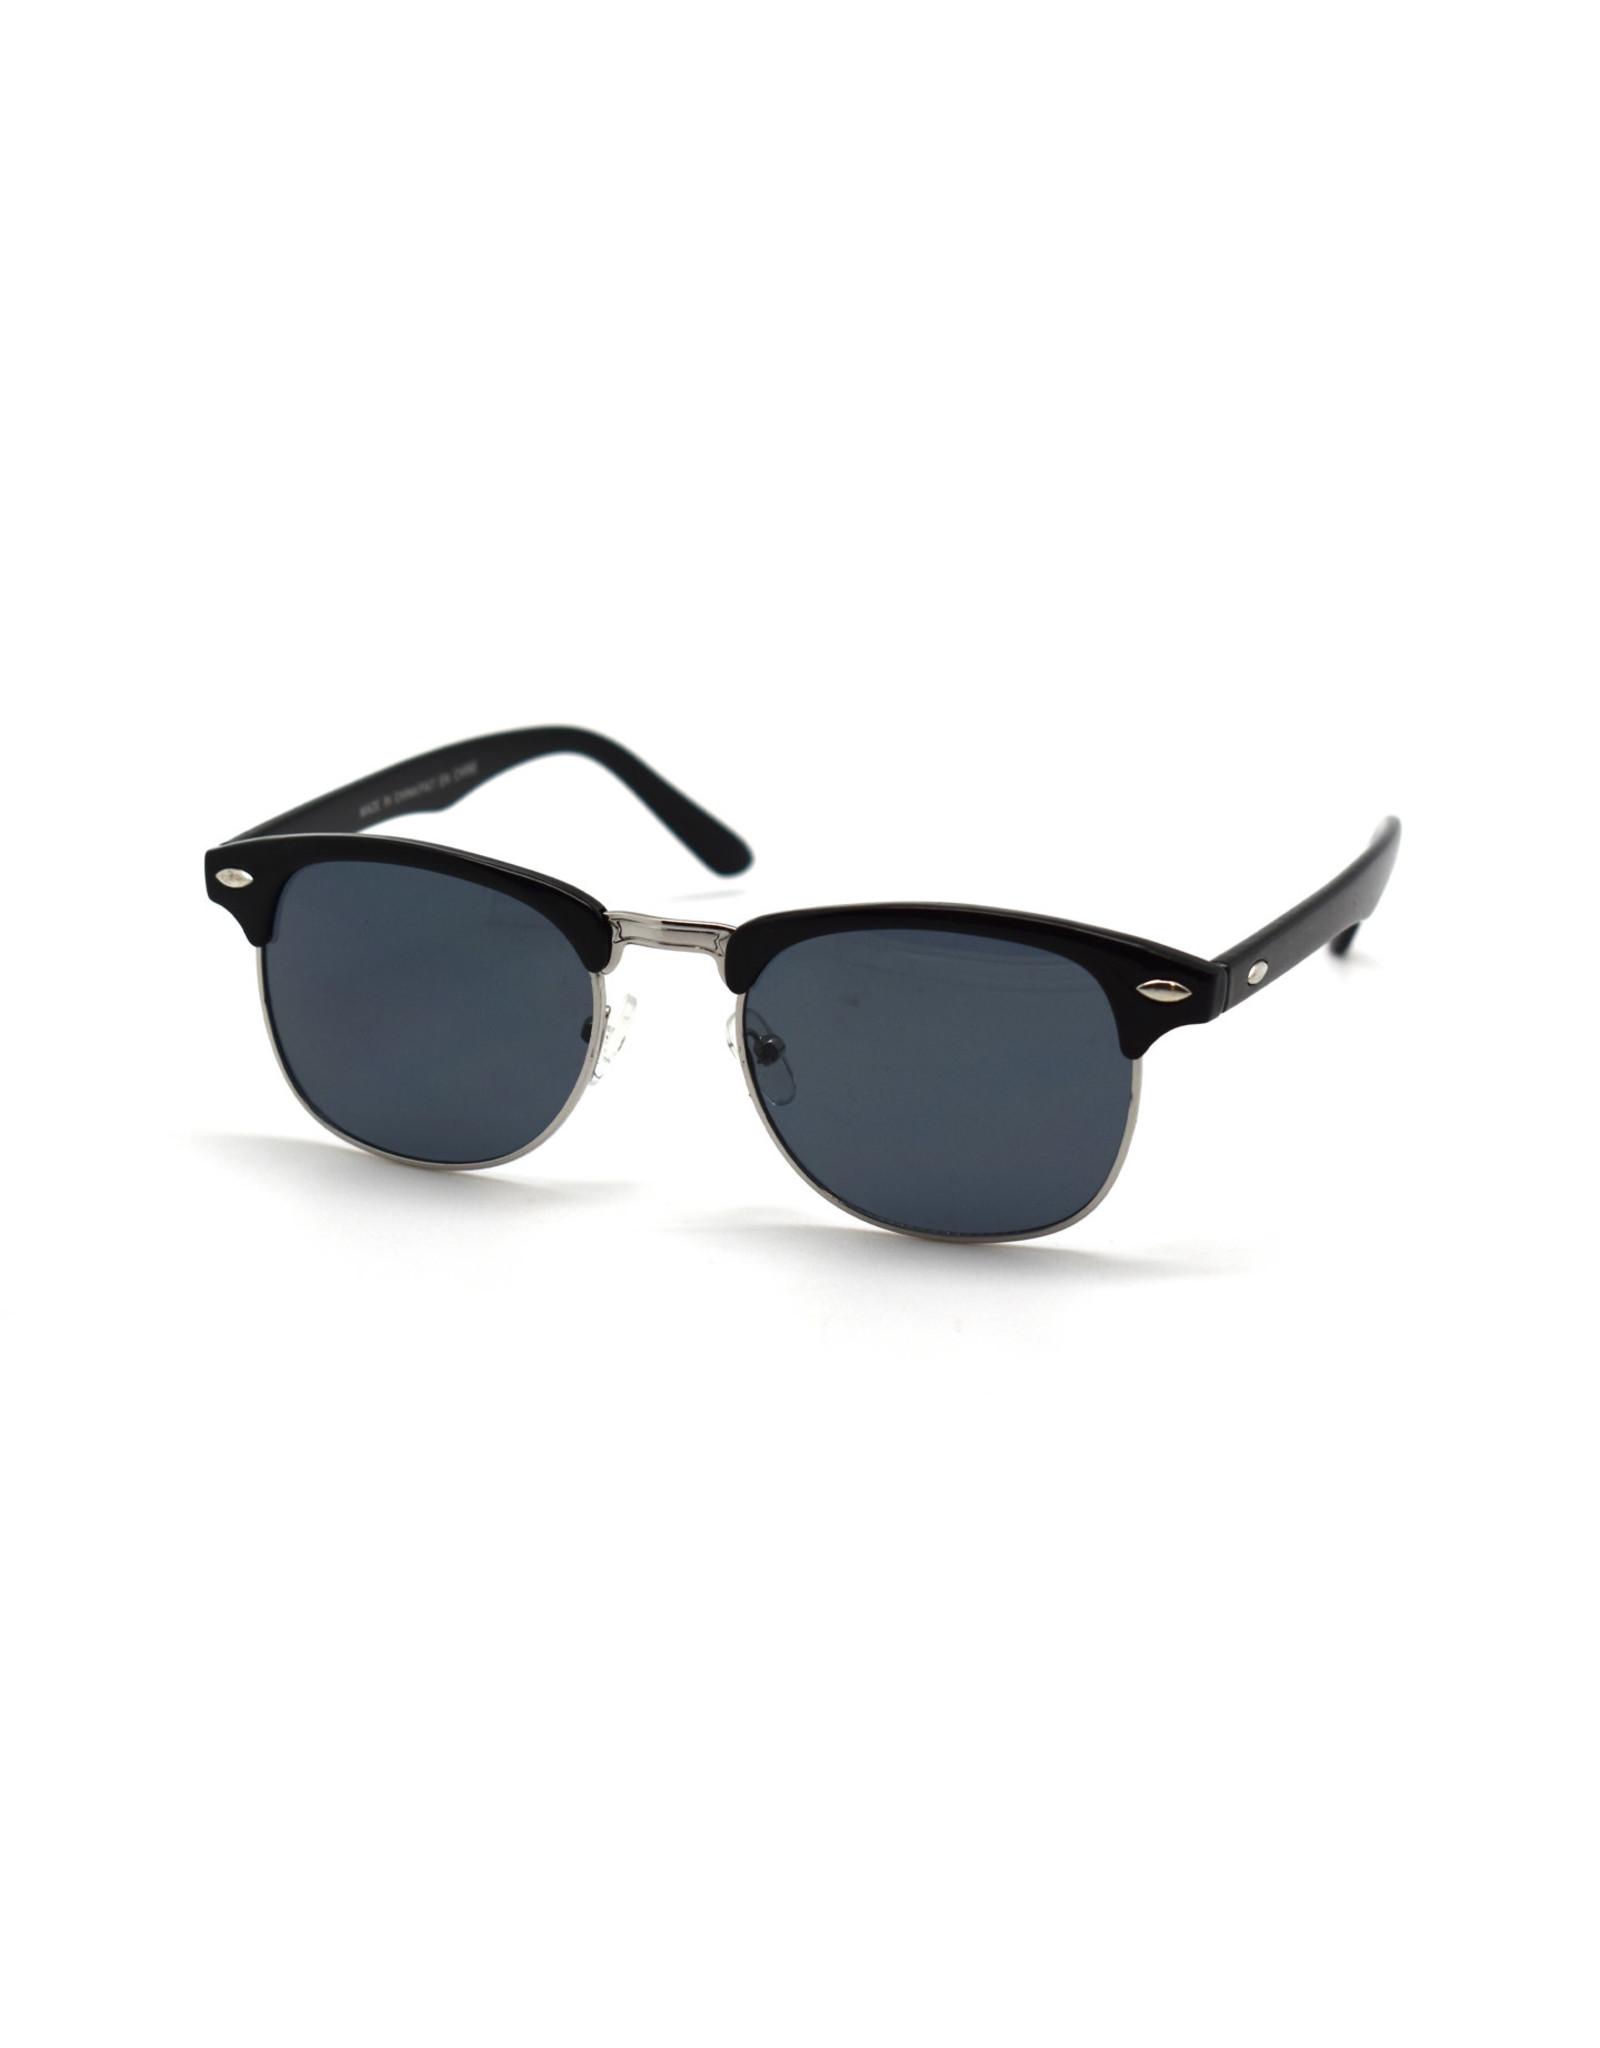 Town Crier Sunglasses